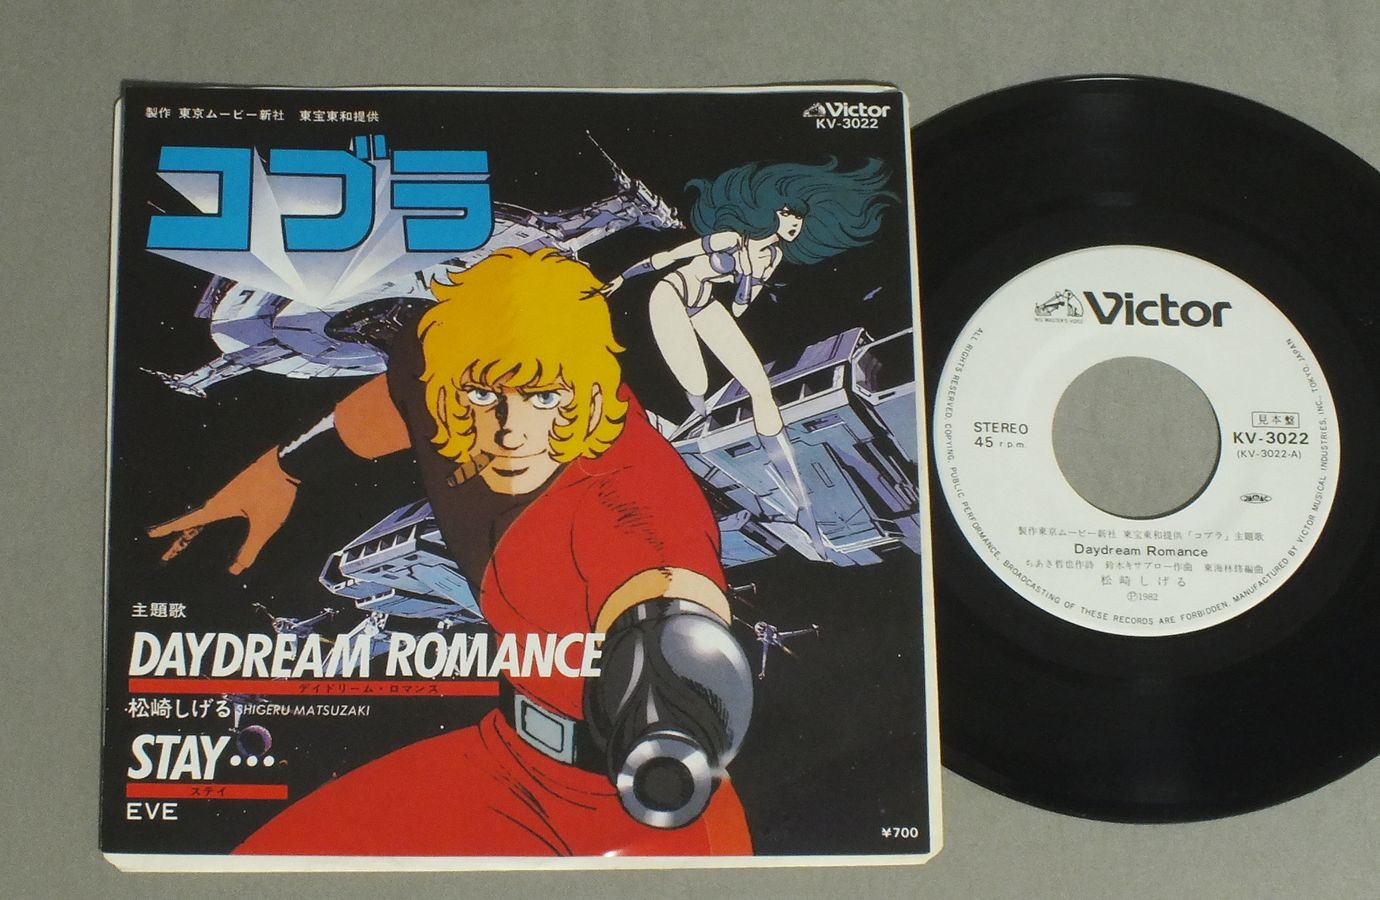 SHIGERU MATSUZAKI - ANIME COBRA MAIN THEME DAYDREAM ROMANCE - 7inch x 1